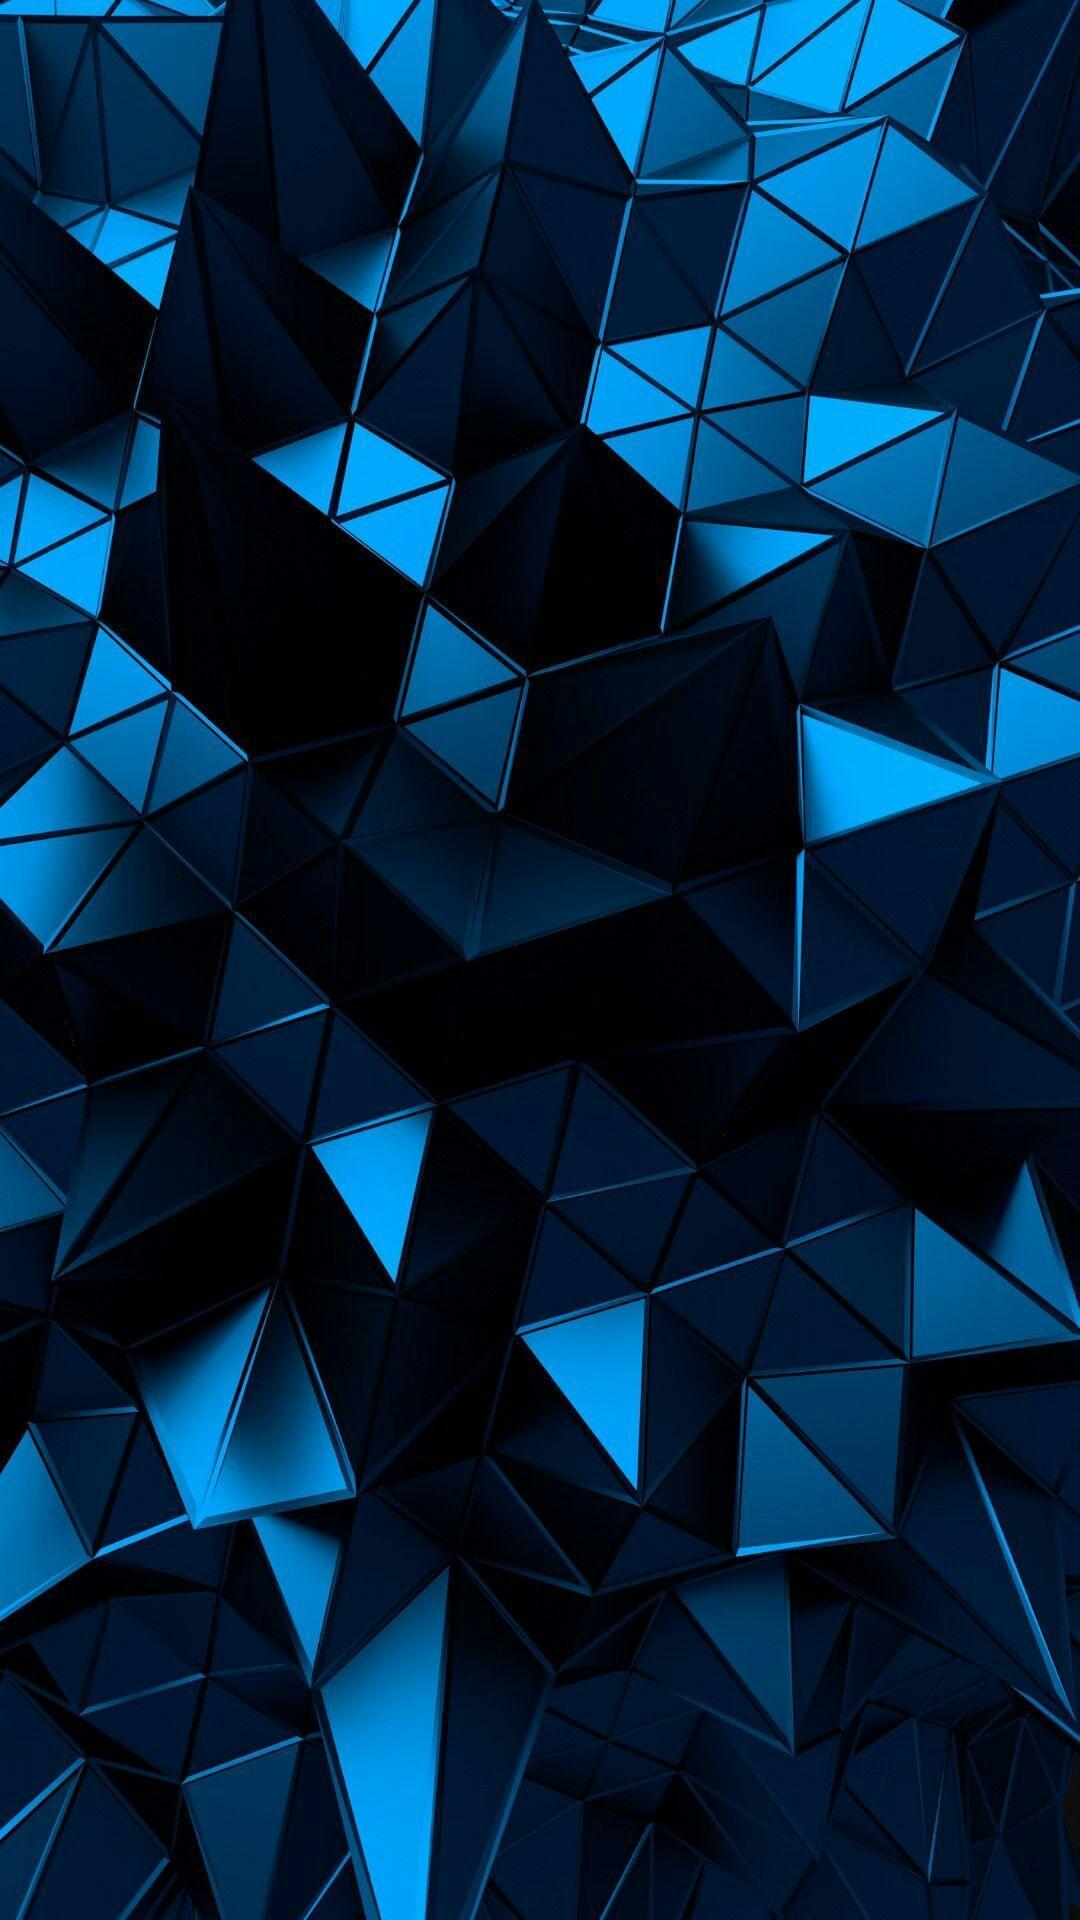 Wallpaper Biru HD - Latar Belakang For Android - APK Download